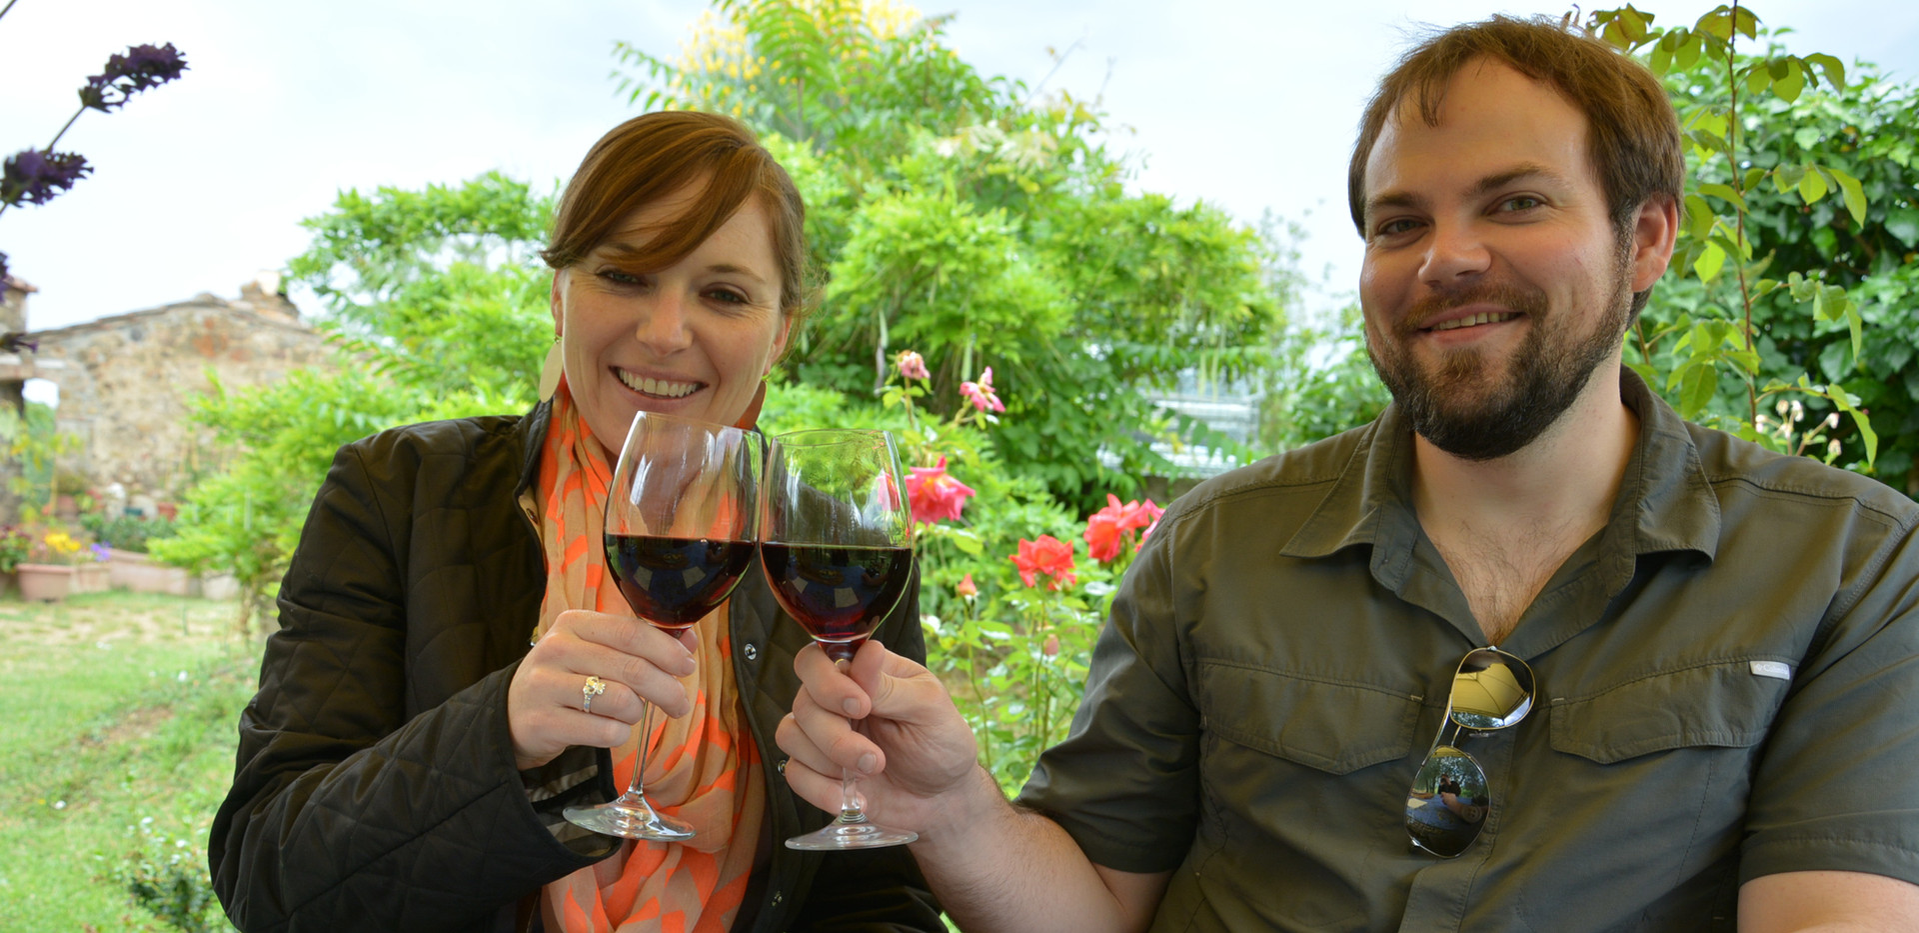 Tasting Brunello on Grape Tours' private tour to Montalcino